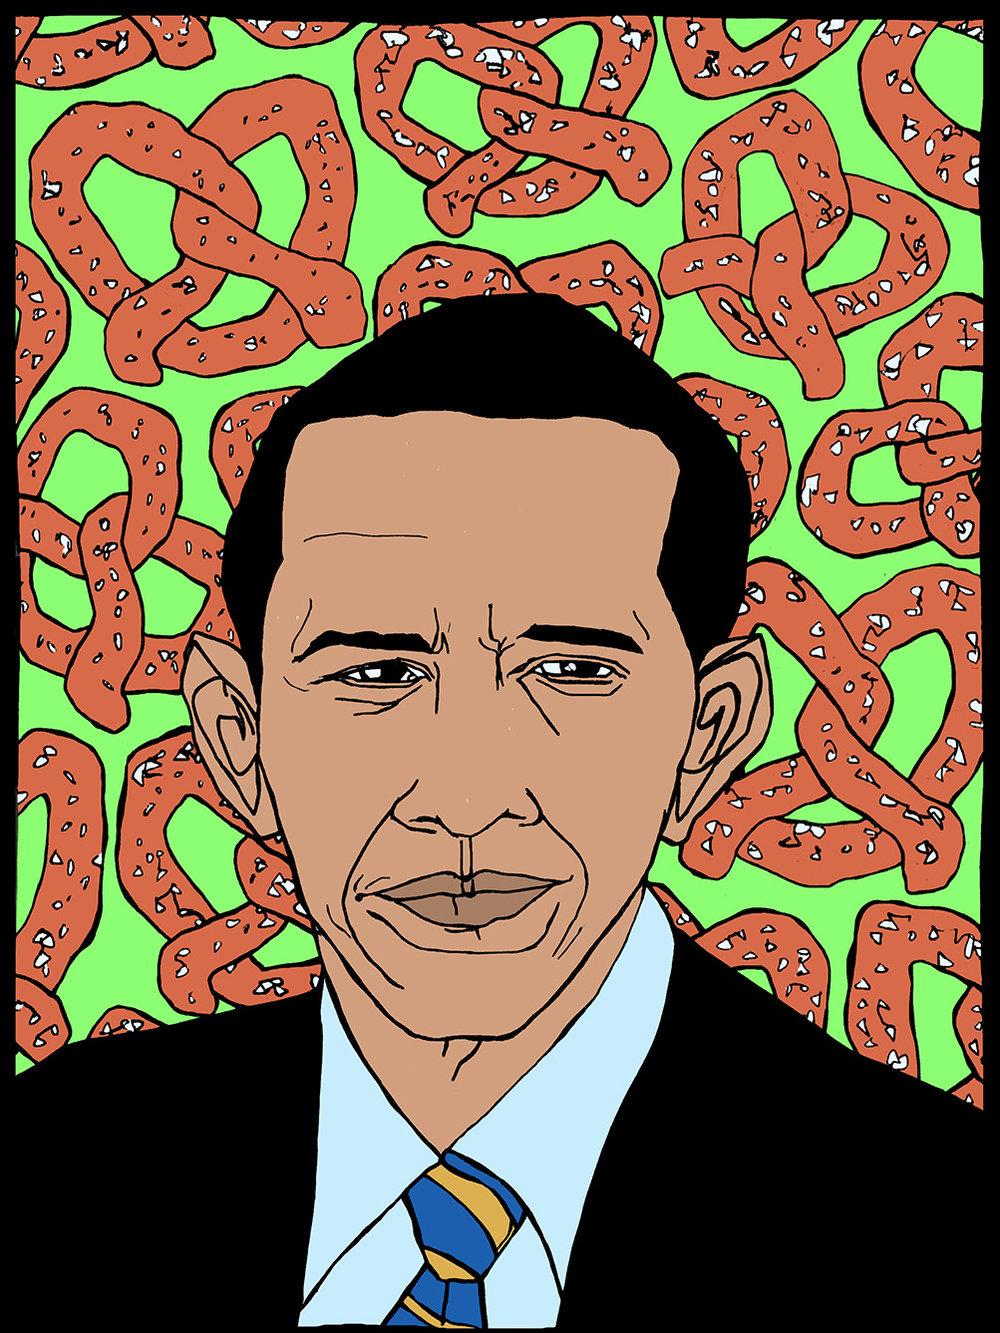 Obama + pretzels